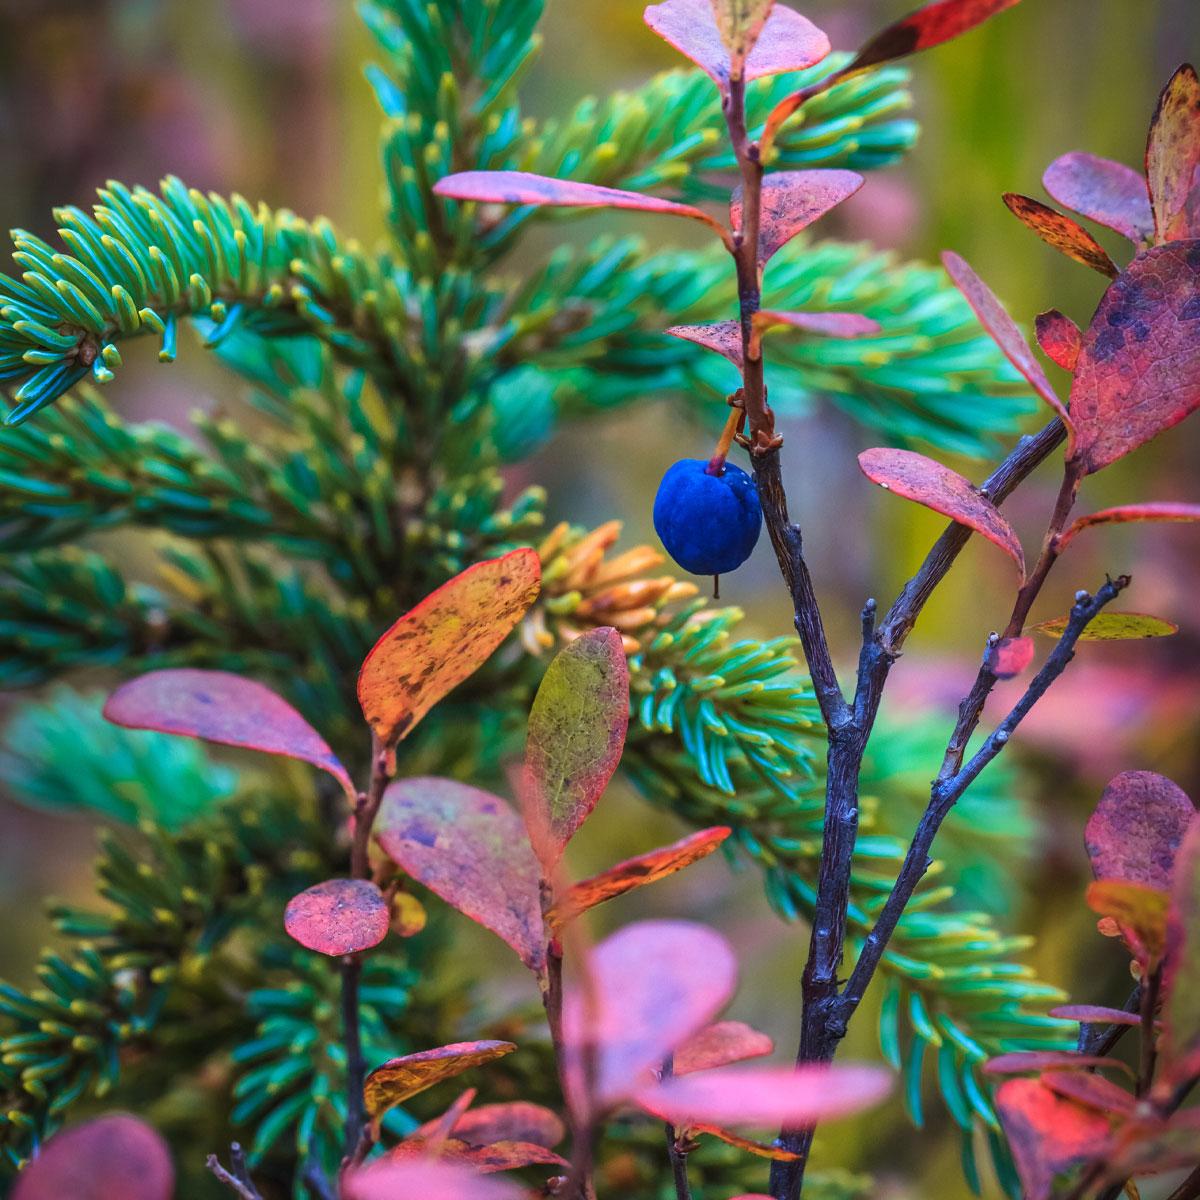 Berries and Greenery